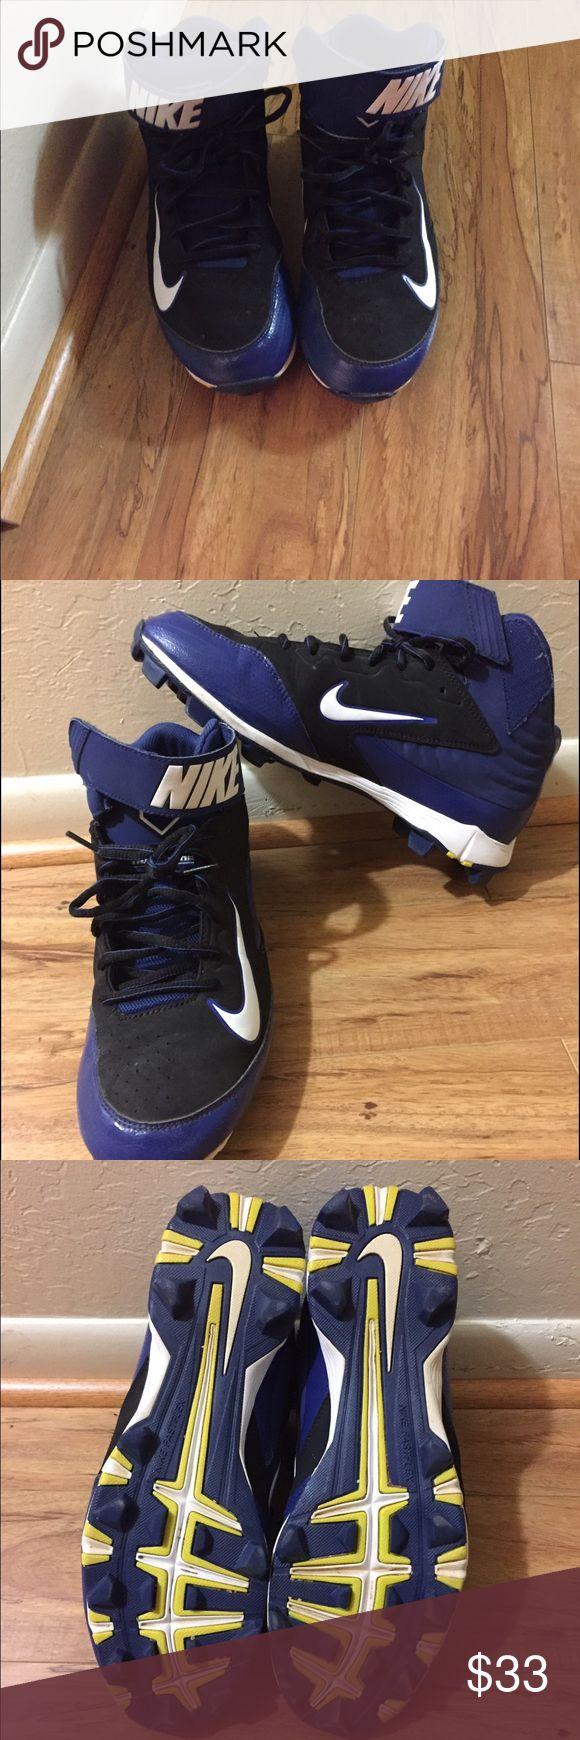 nike baseball turf cleats nike light tennis shoes